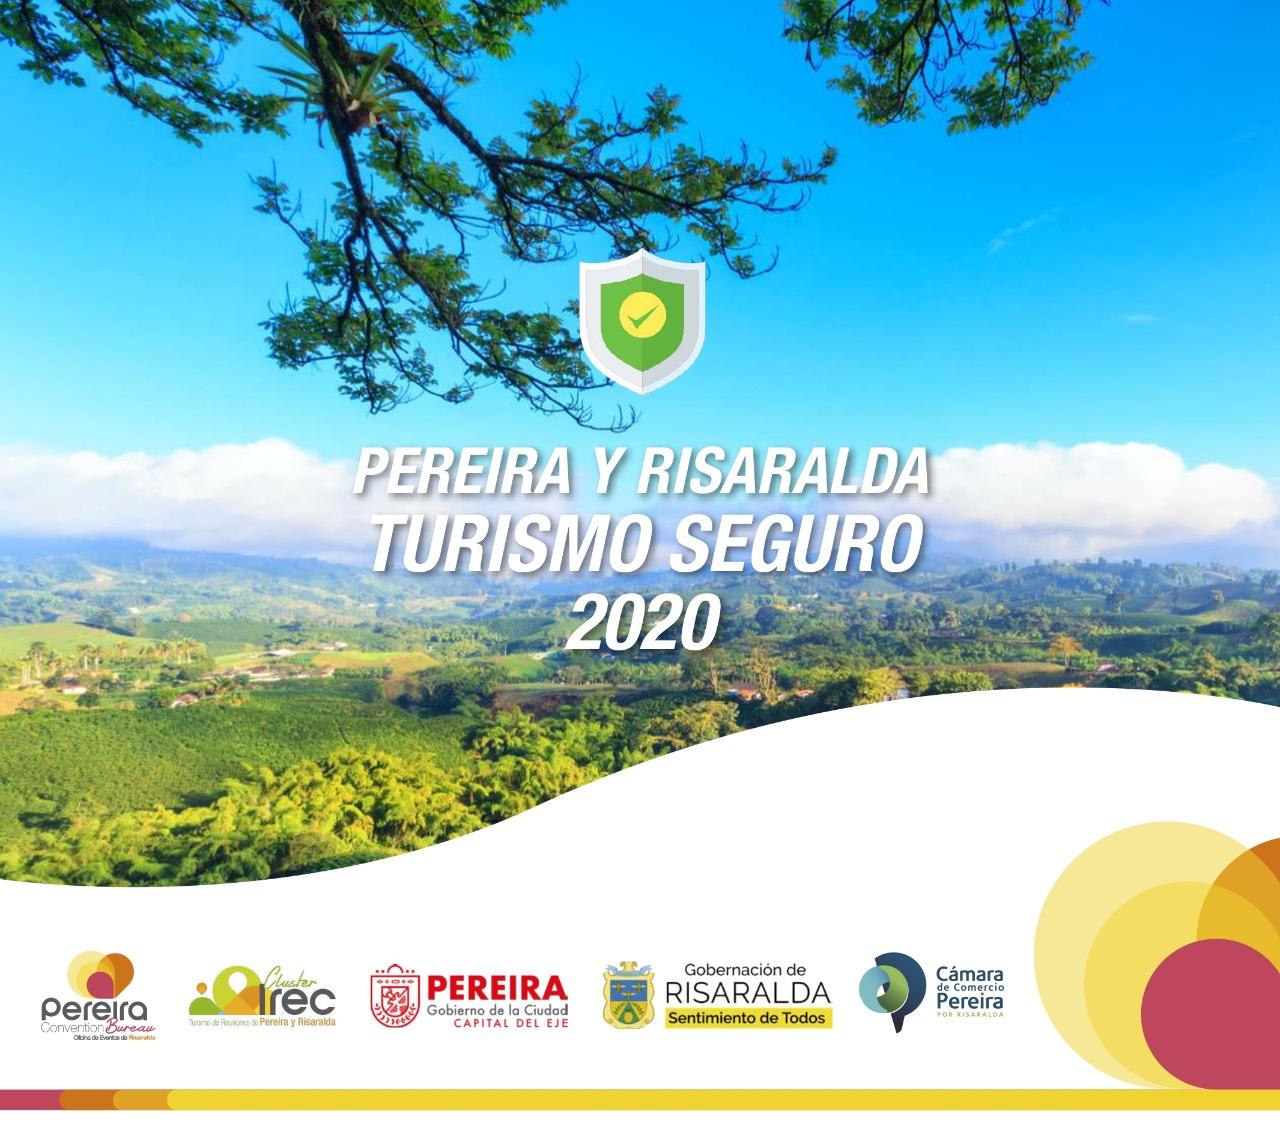 Turismo Seguro en Risaralda